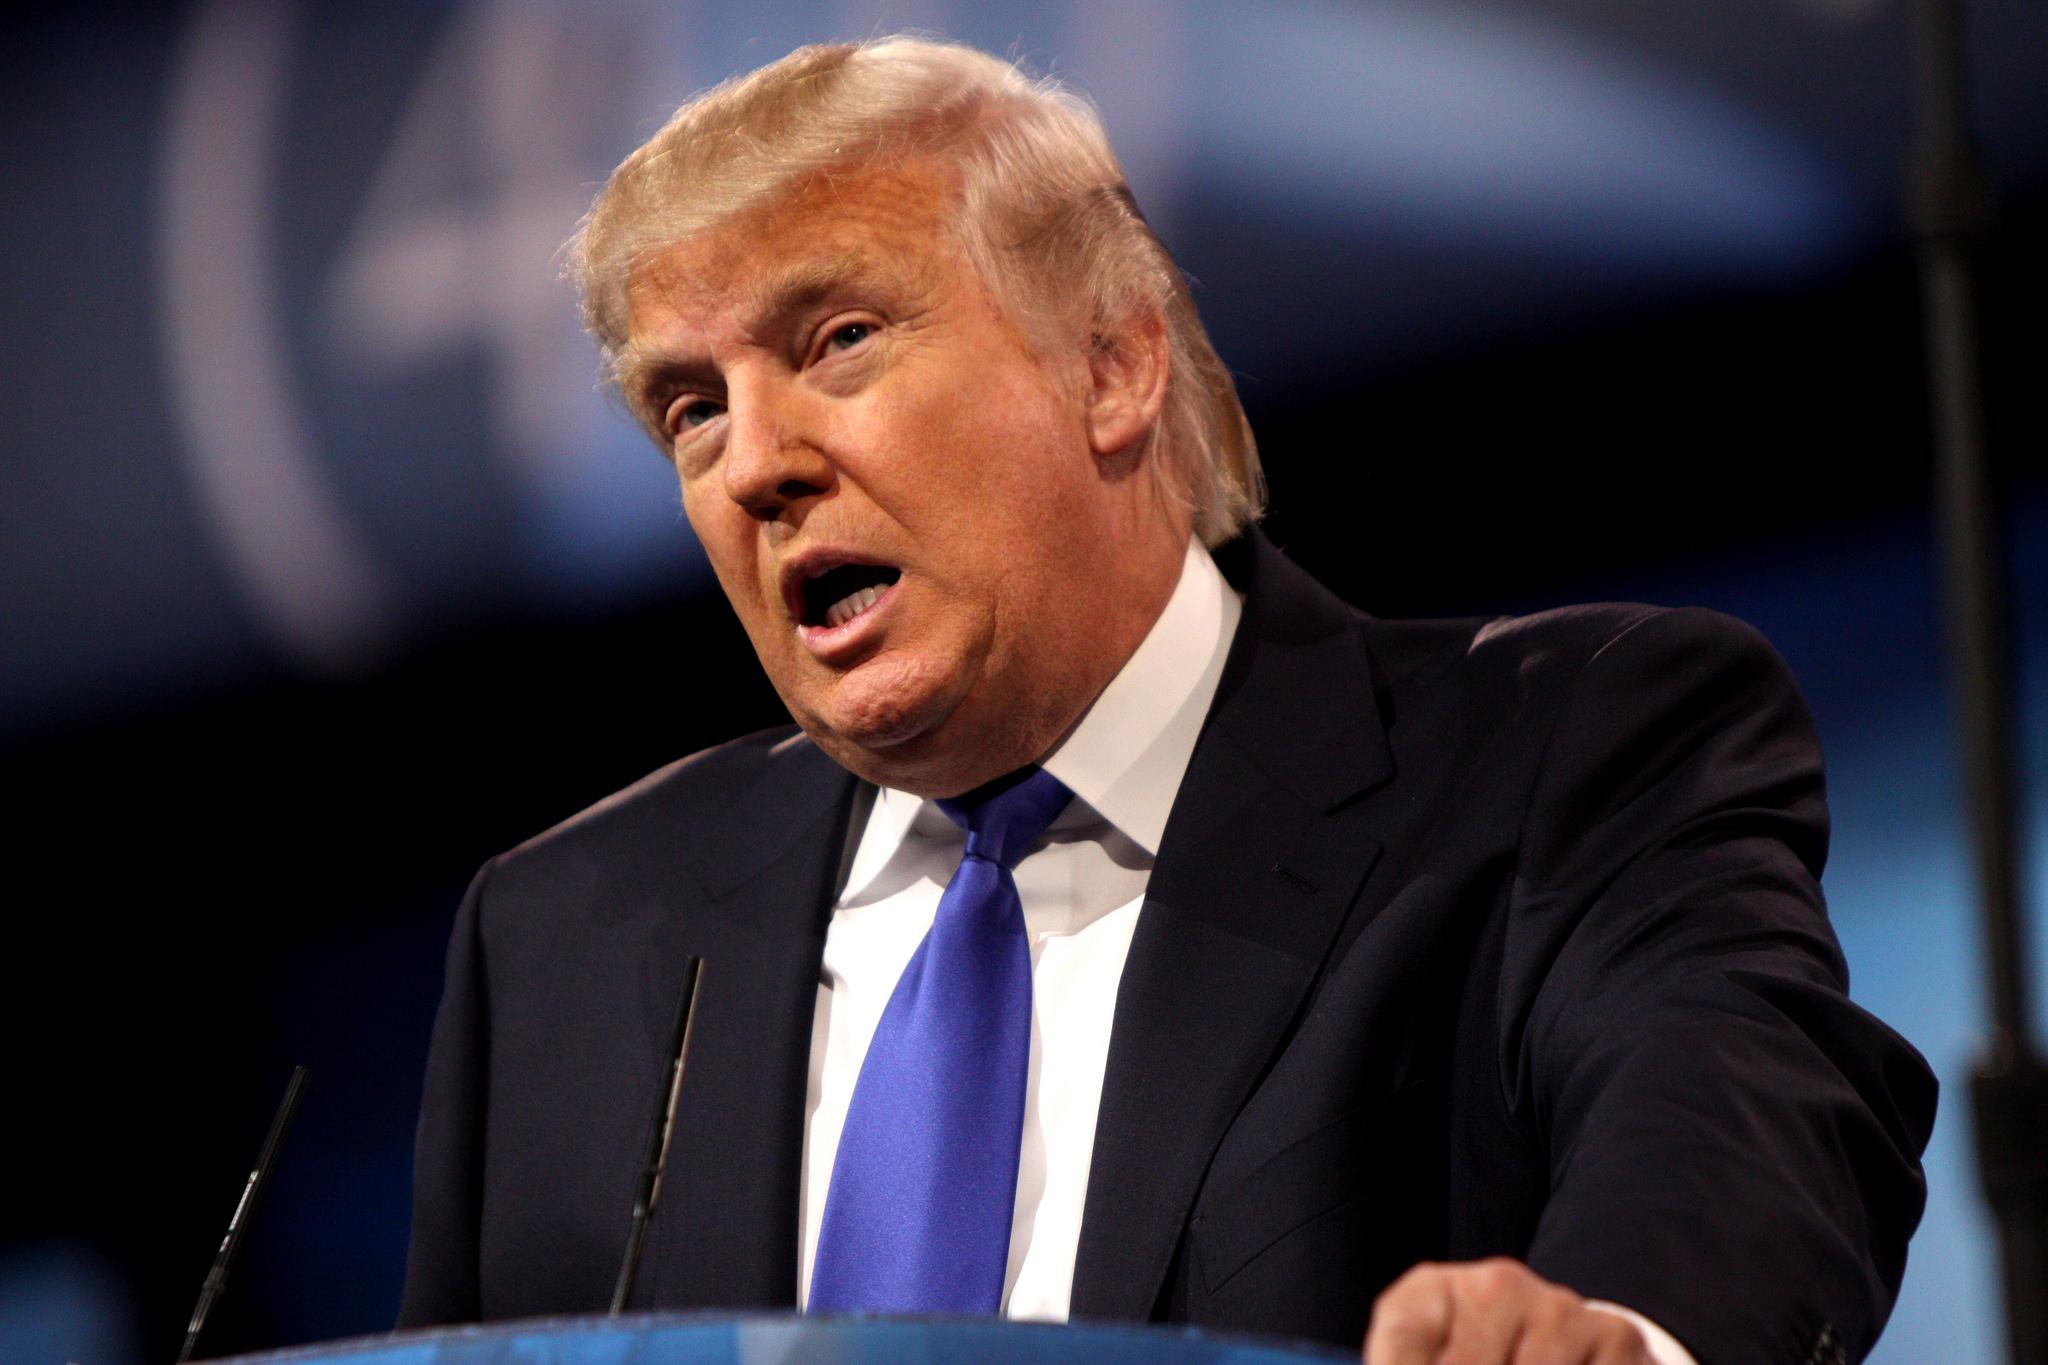 Is Donald Trump Deleting Anti-Immigrant Tweets?